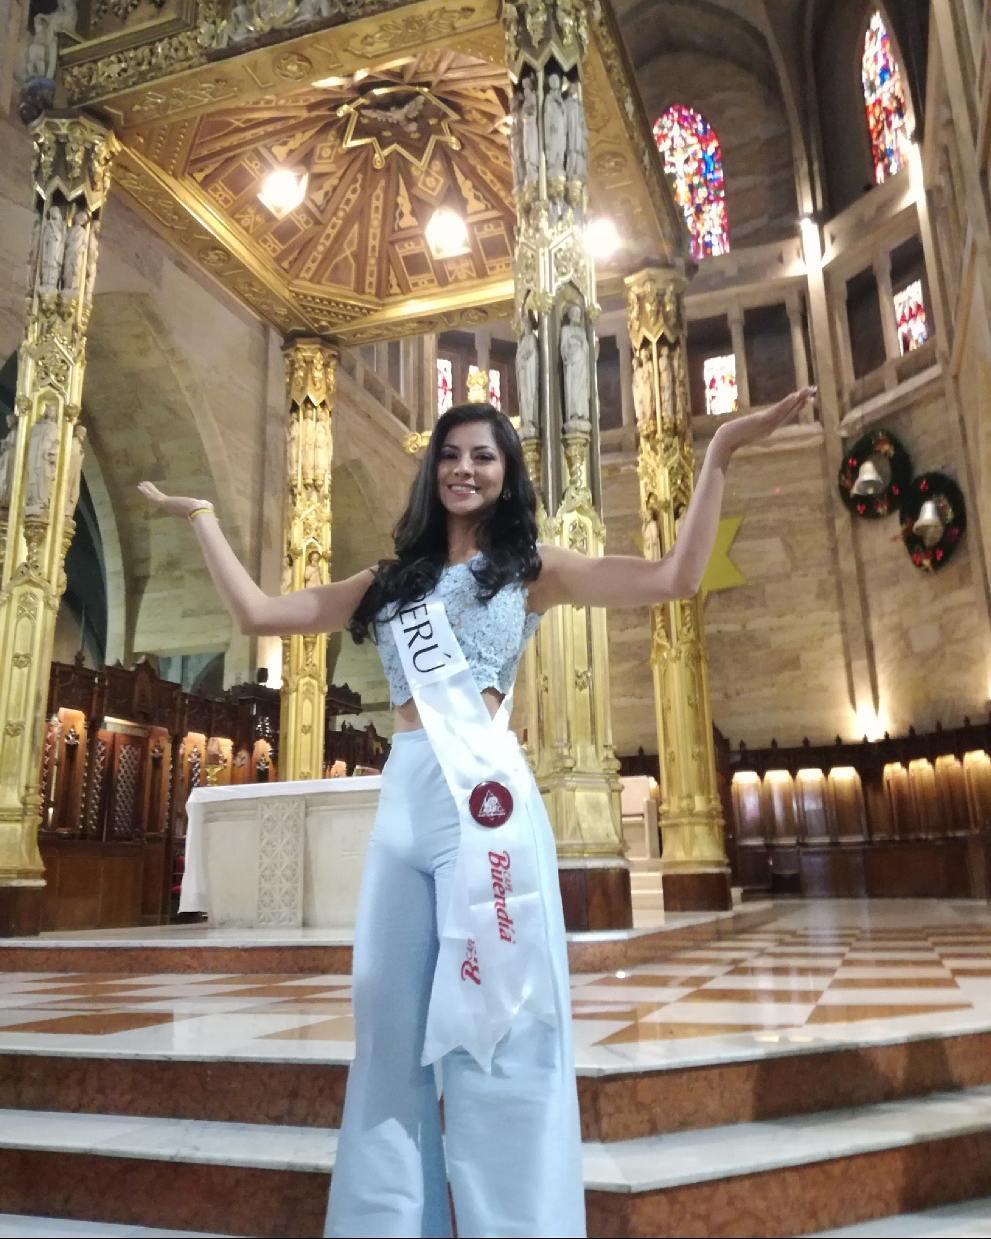 gabriela lambruschini, miss peru reyna internacional cafe 2018. - Página 4 26154810